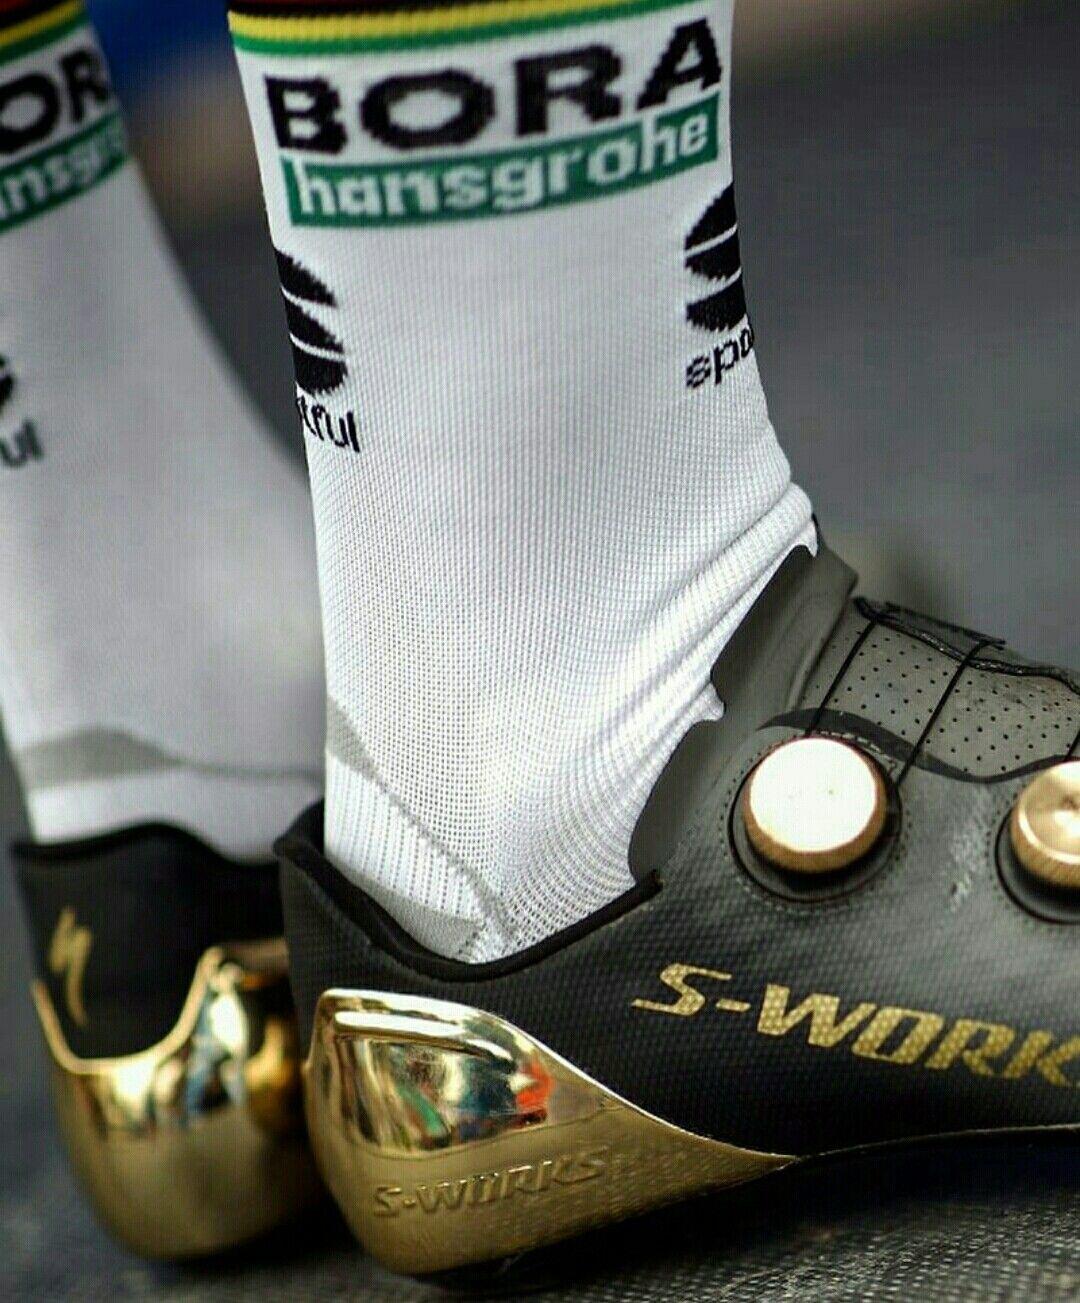 Peter Sagan race shoes | 自転車, ビンディング, シューズ